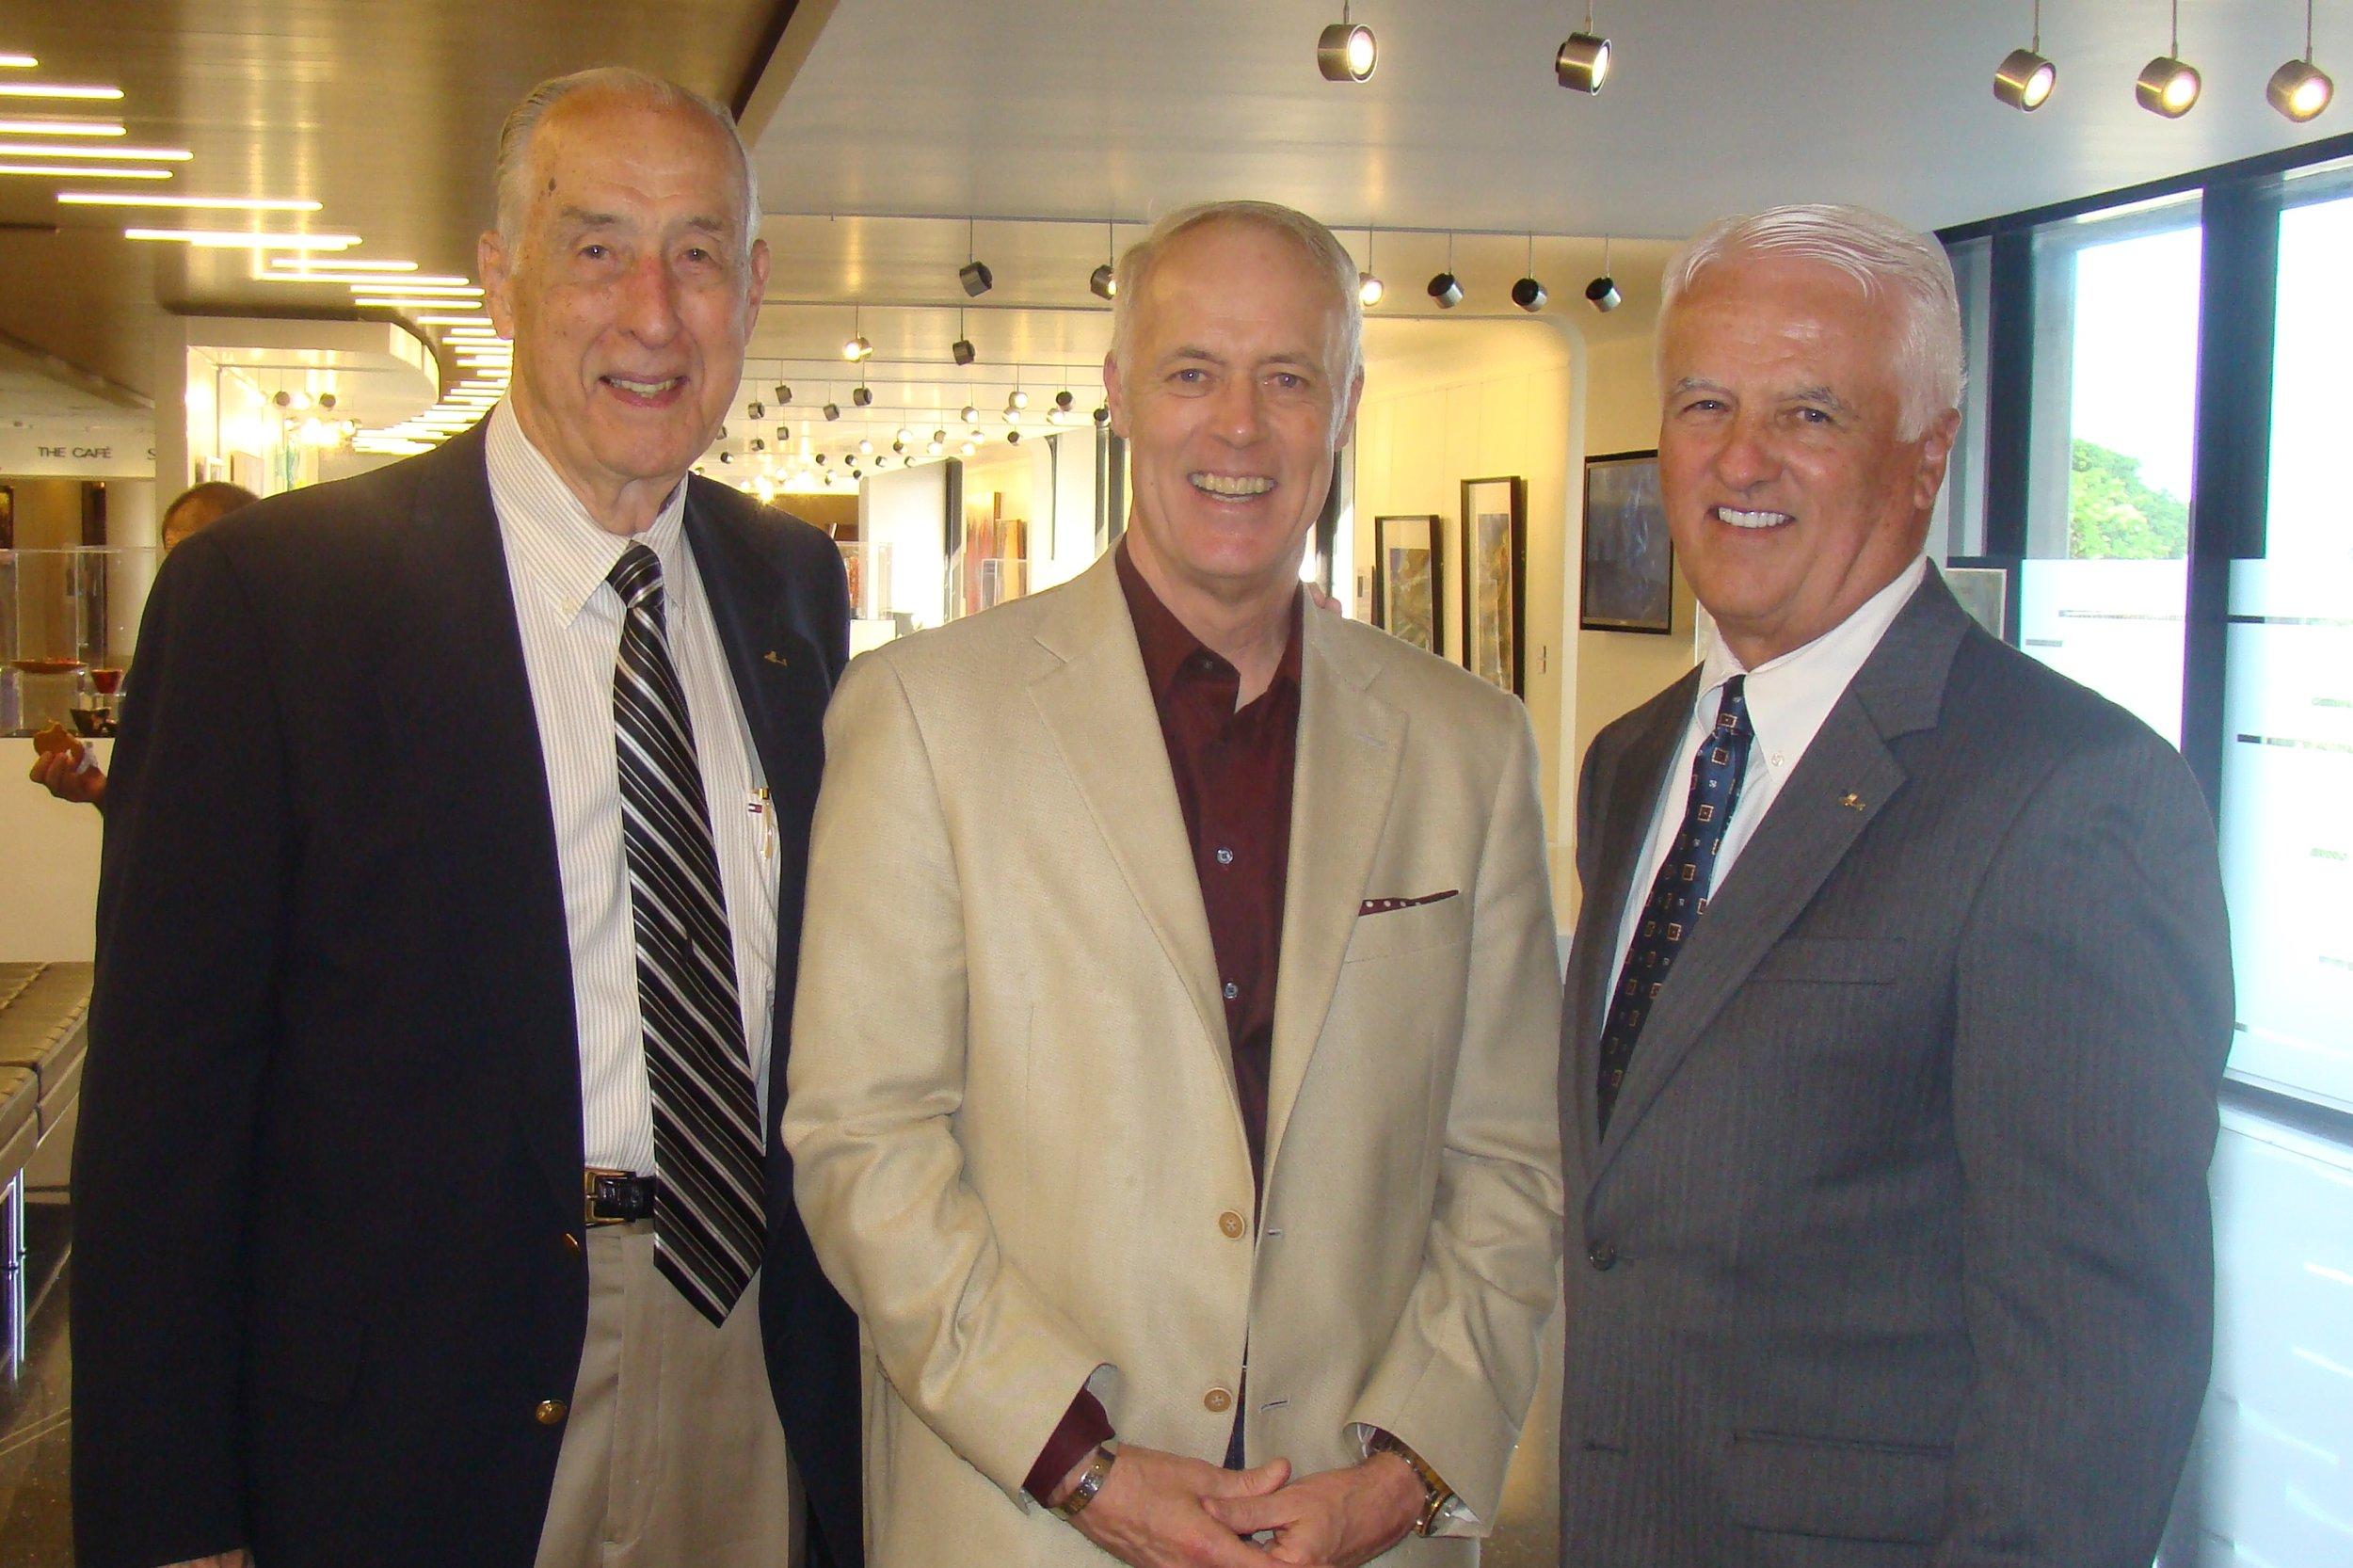 Me, Dick & John O'Connor - 2, 30 Oct '14.JPG